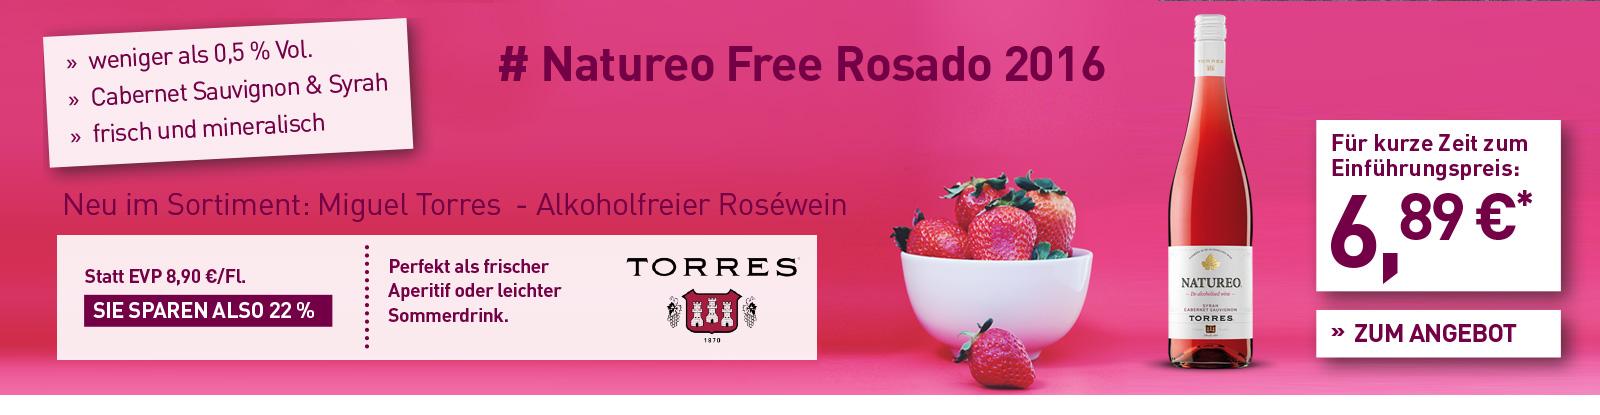 Natureo Free Rosado 2016